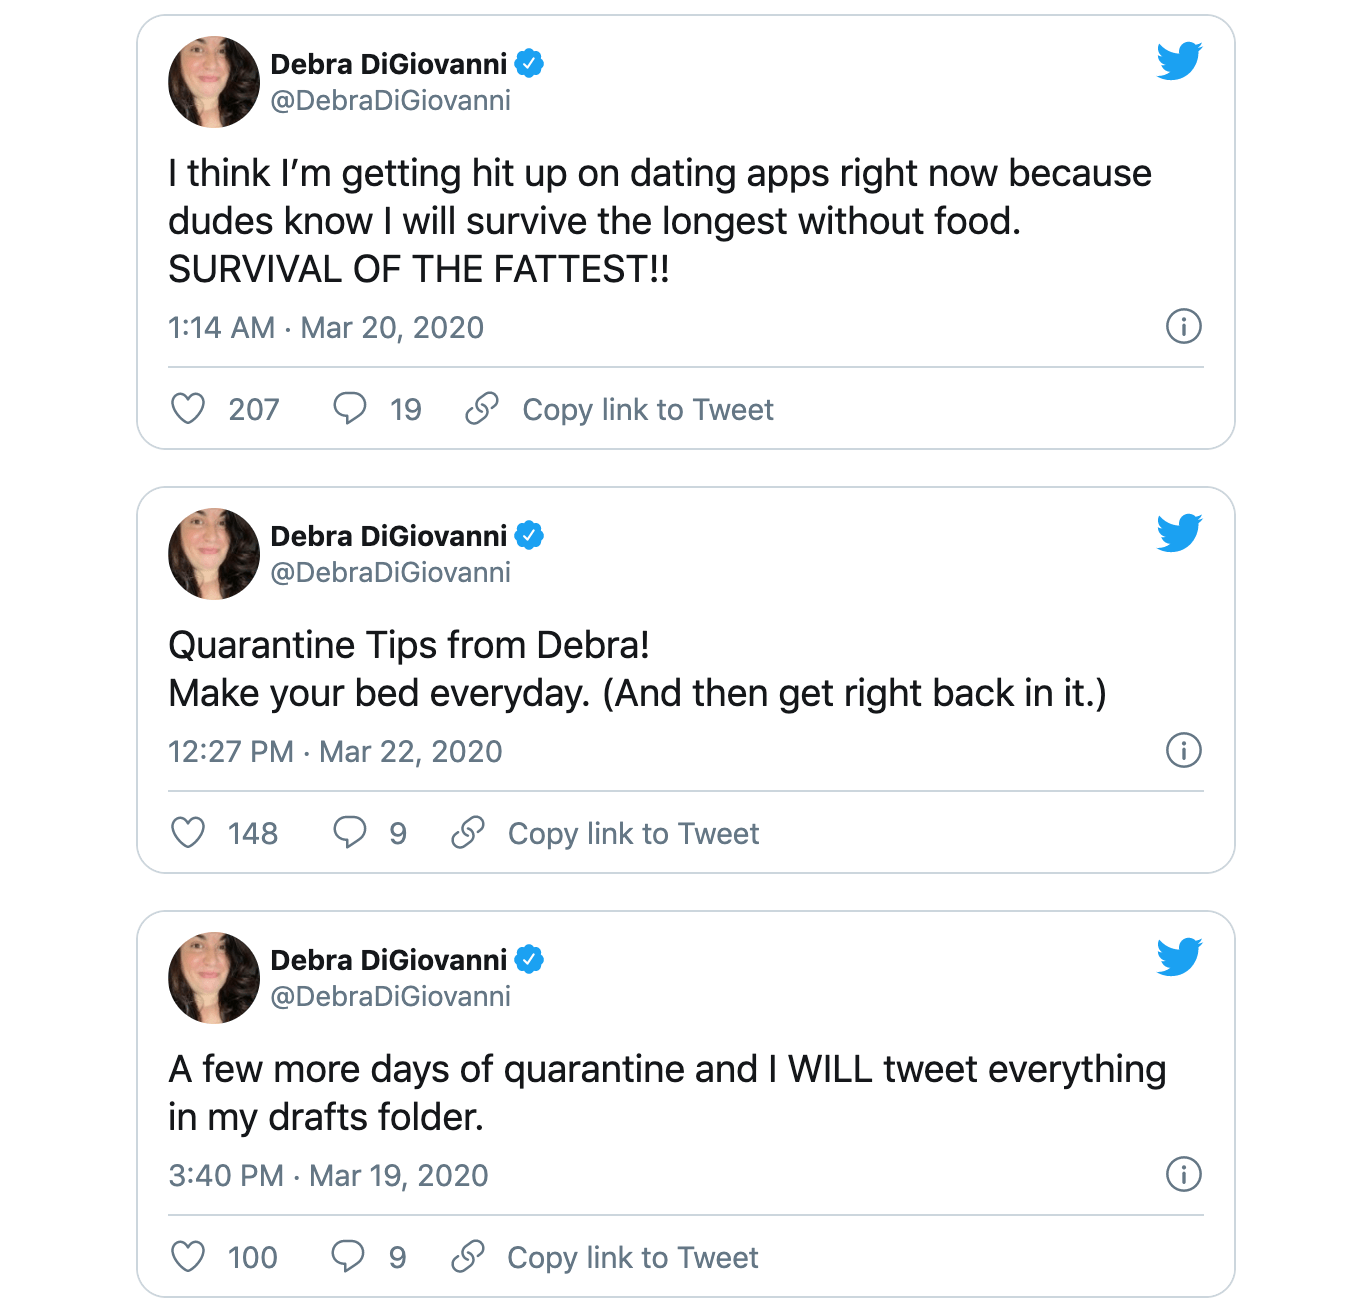 Debra DiGiovanni Twitter